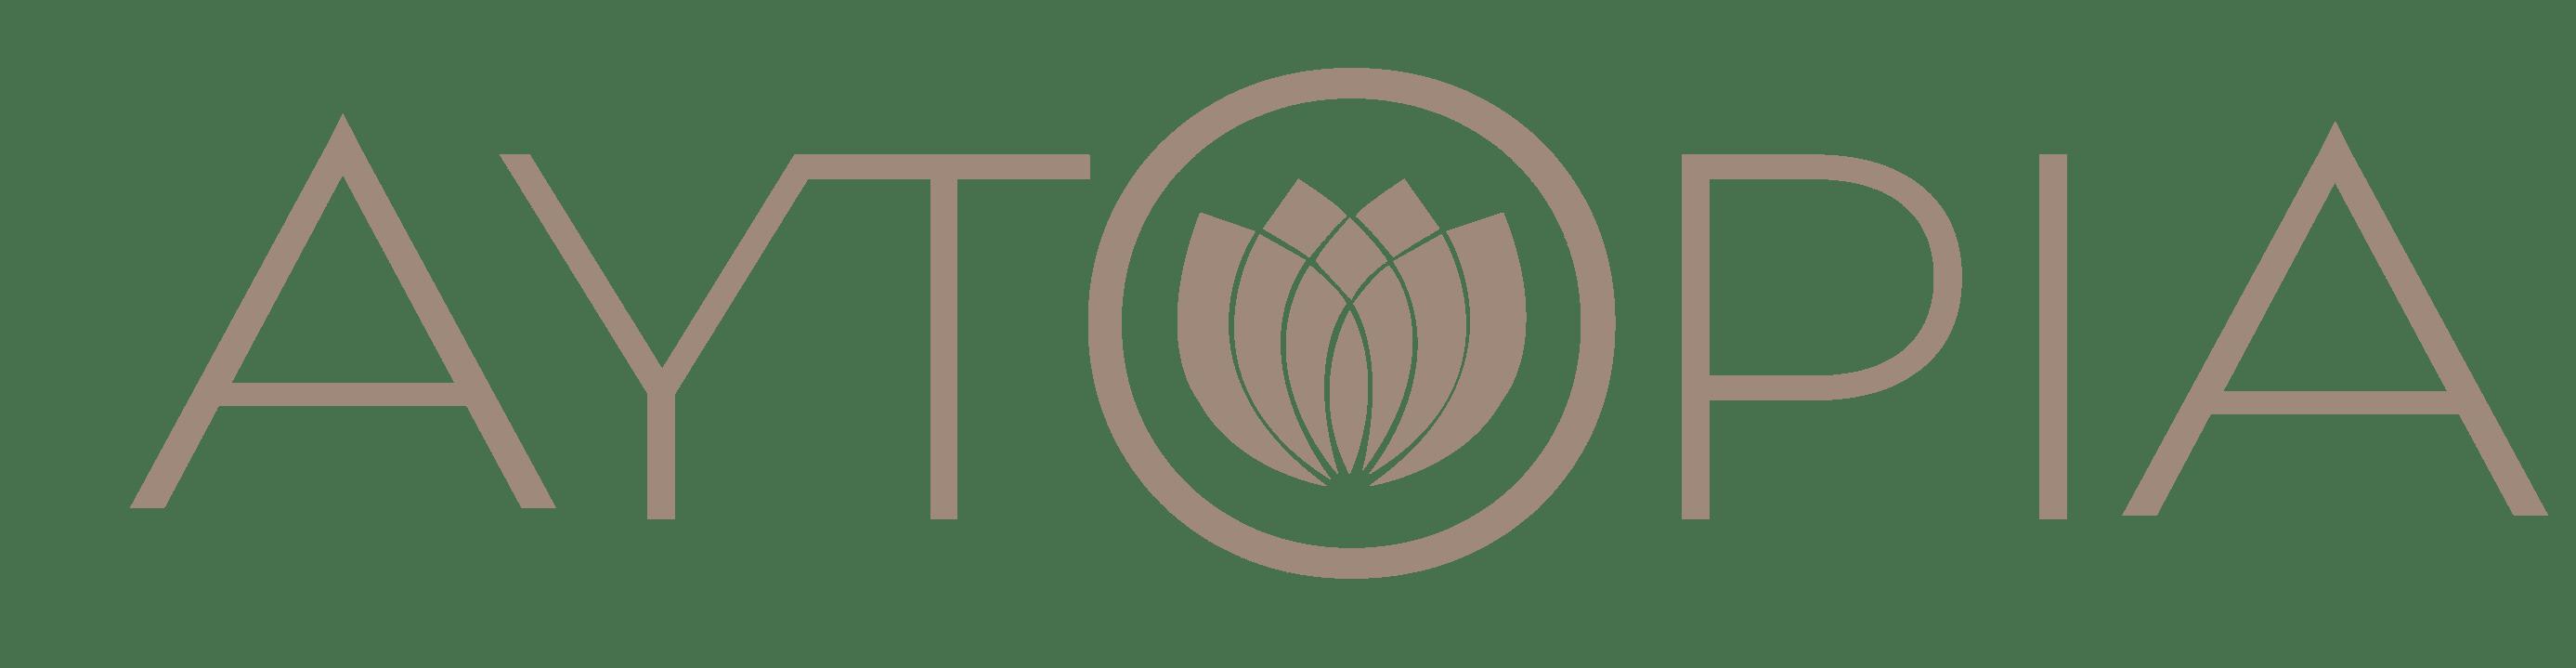 Aytopia logo 01